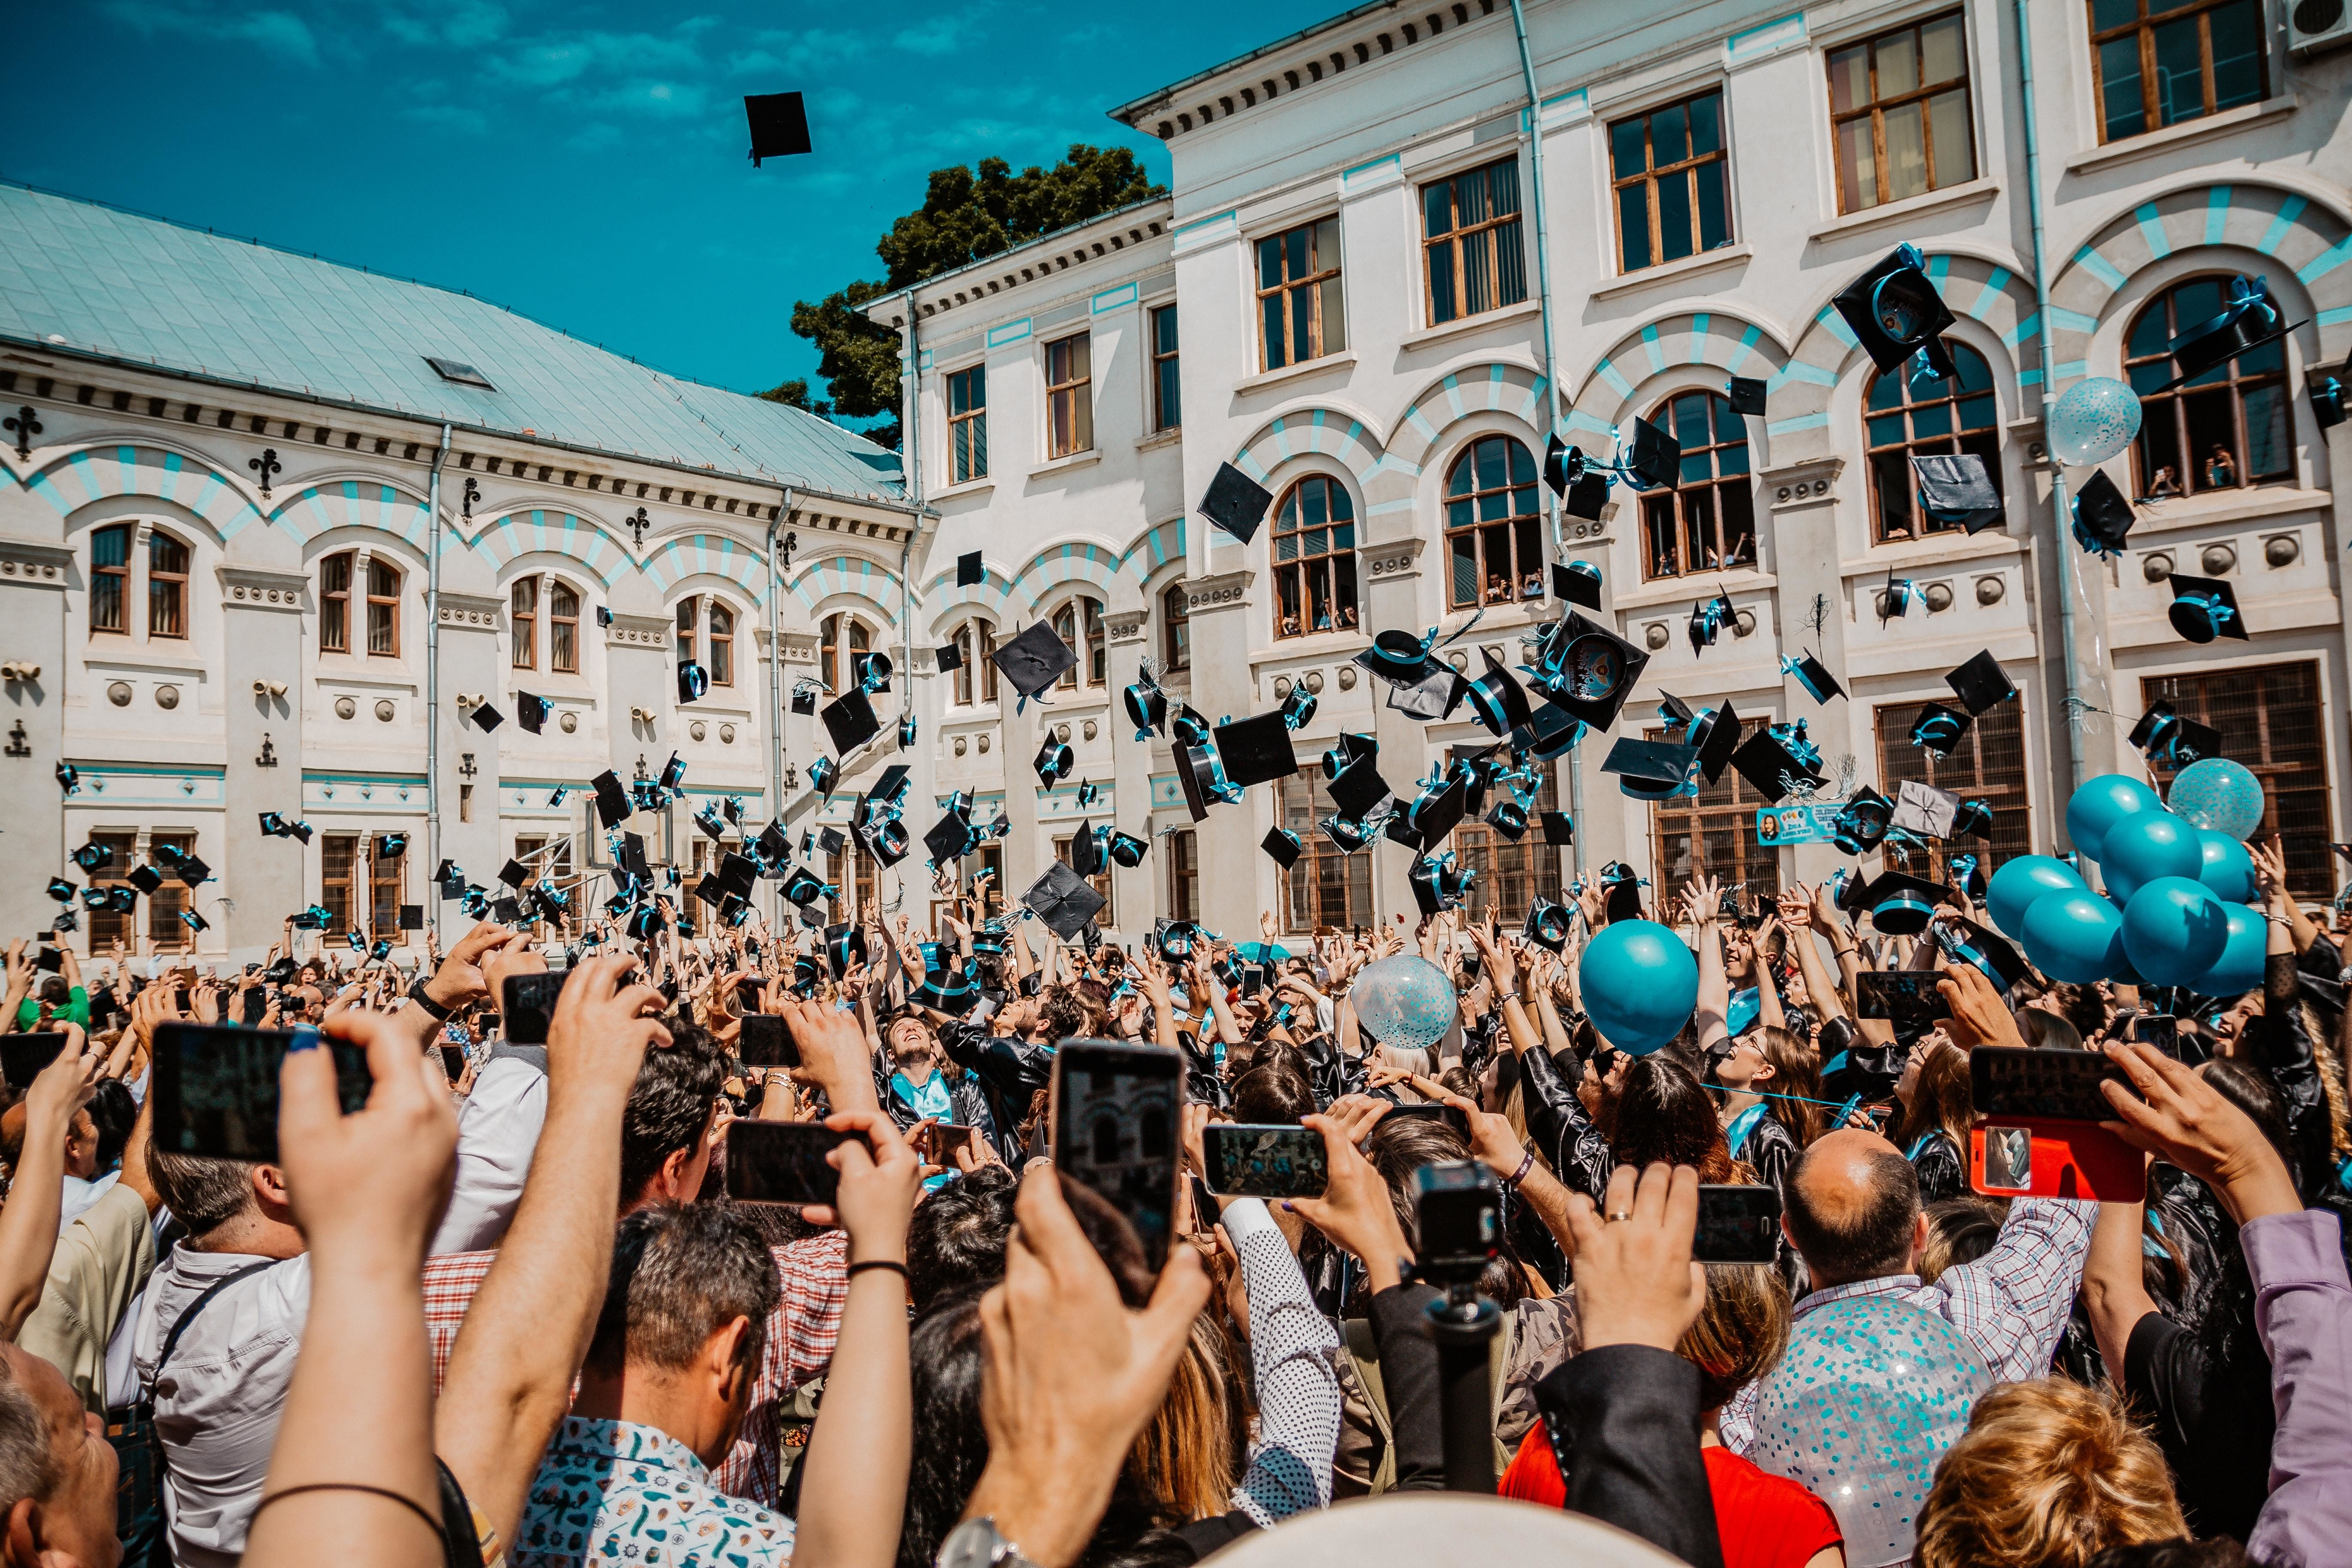 graduation ceremony at a university